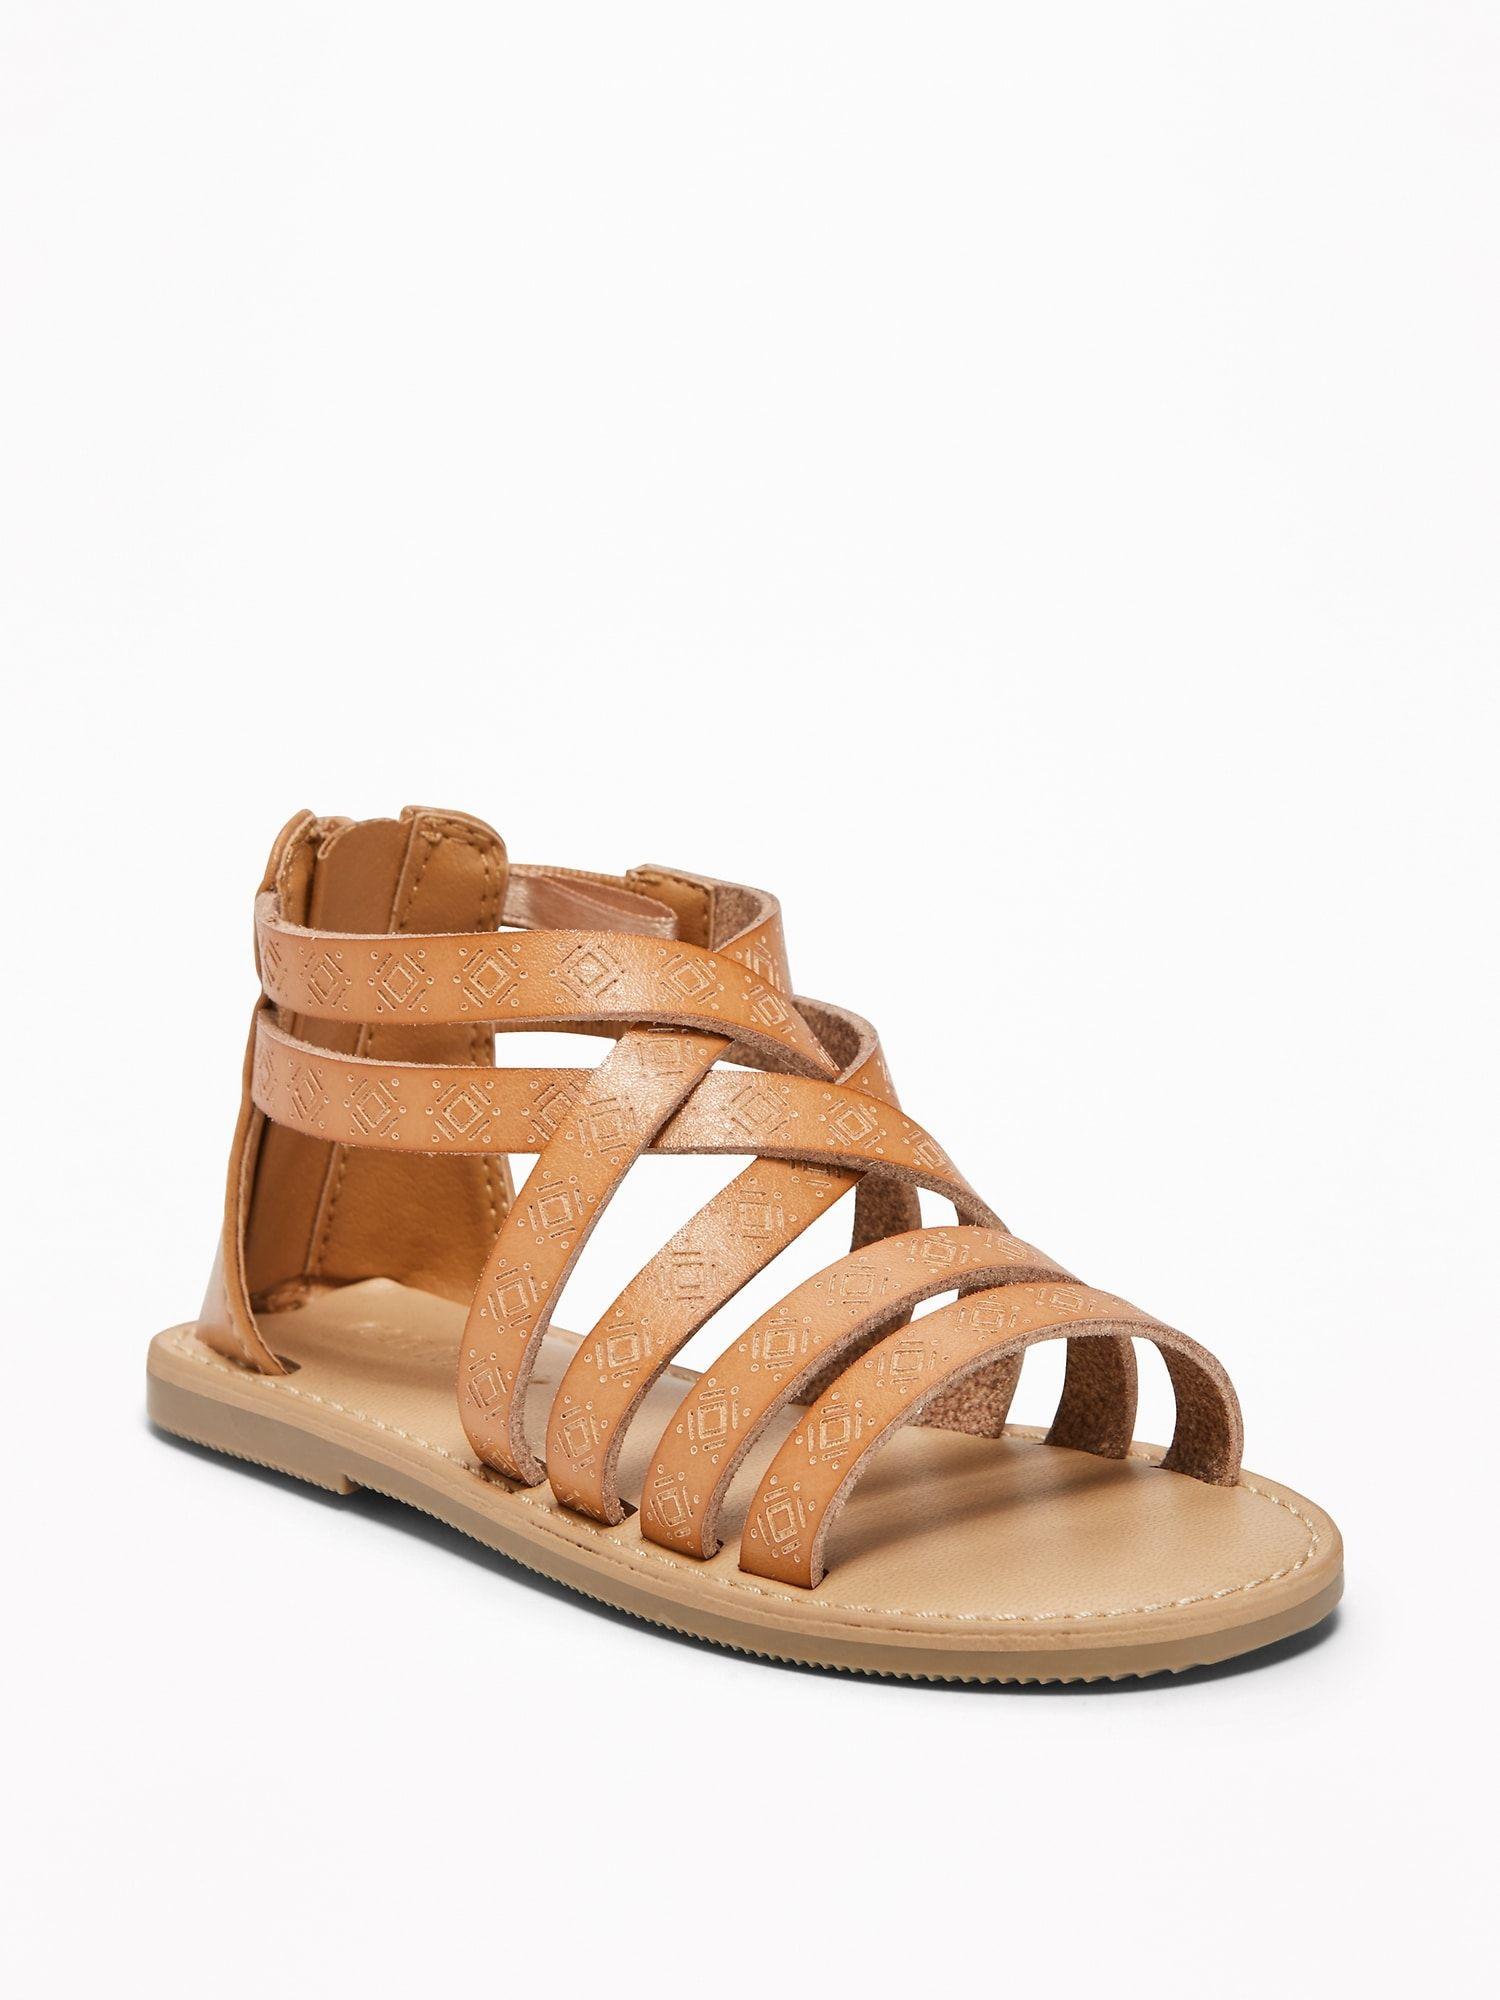 Gladiator Sandals for Toddler Girls